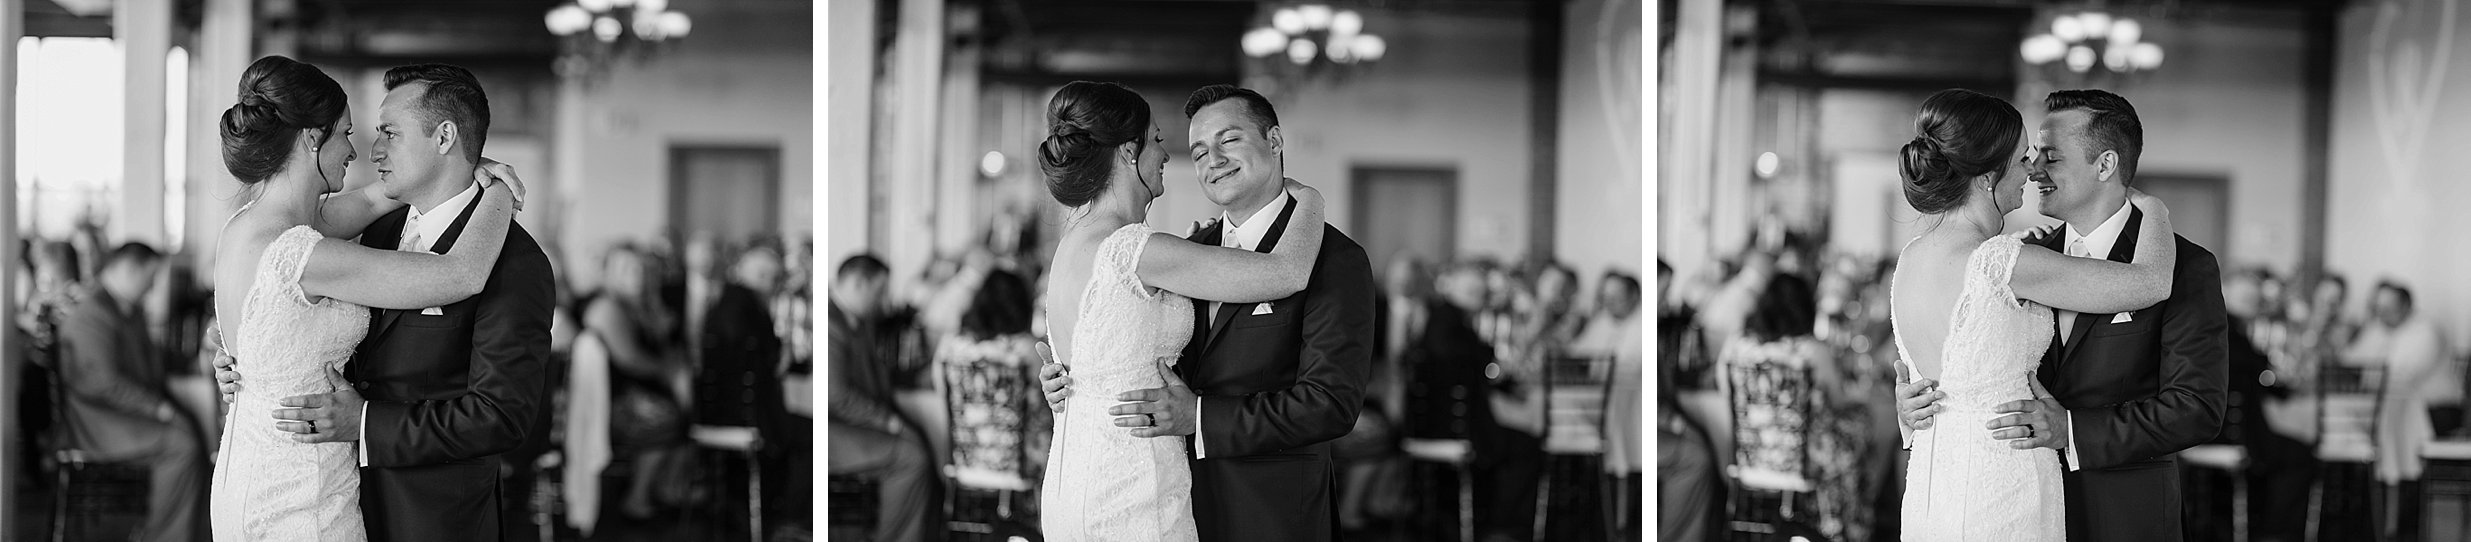 ariel international wedding cleveland_0059.jpg